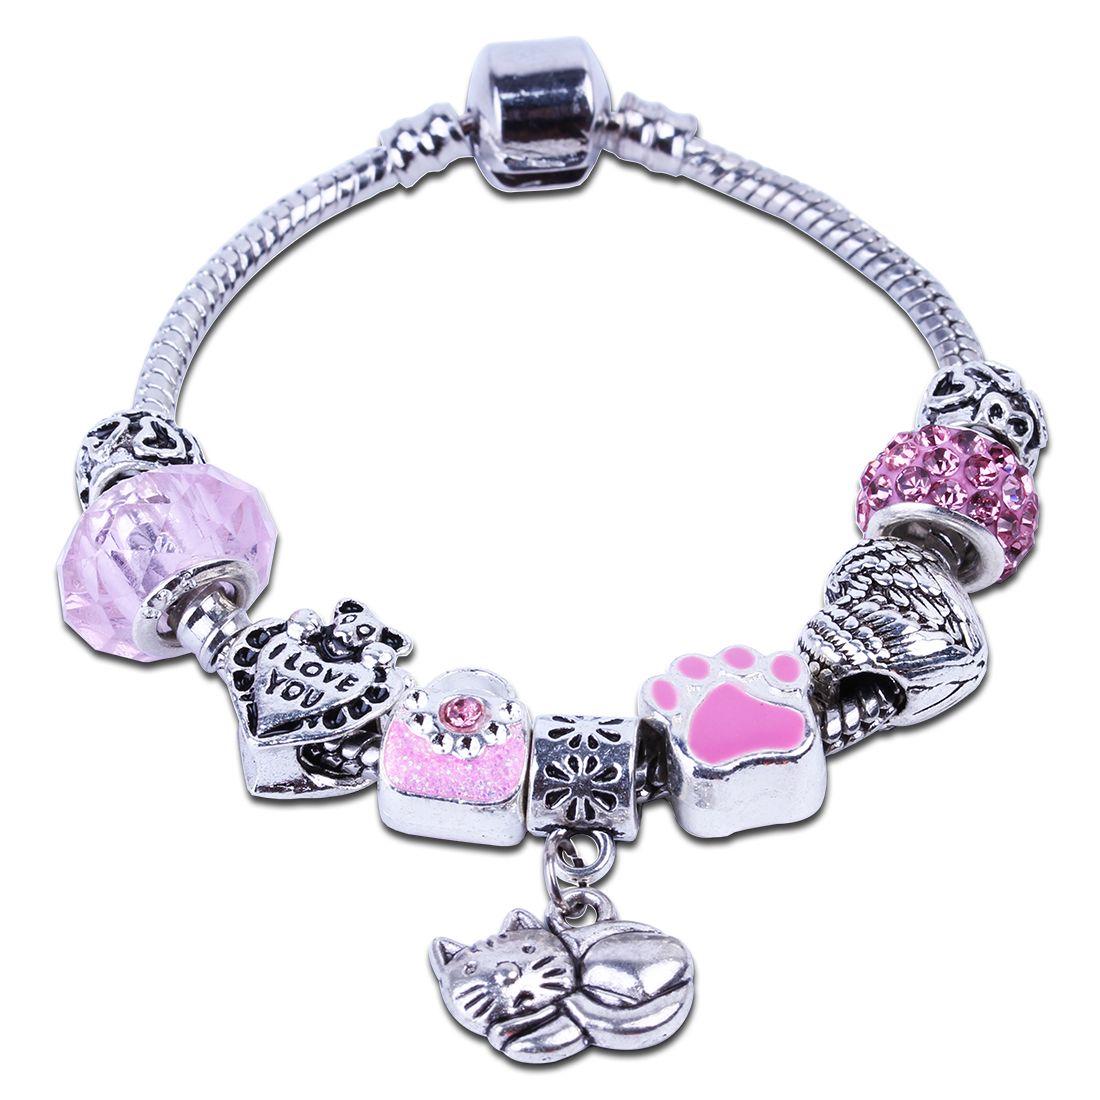 Fashion european pink handbag crystal glass charm bracelet diy beads